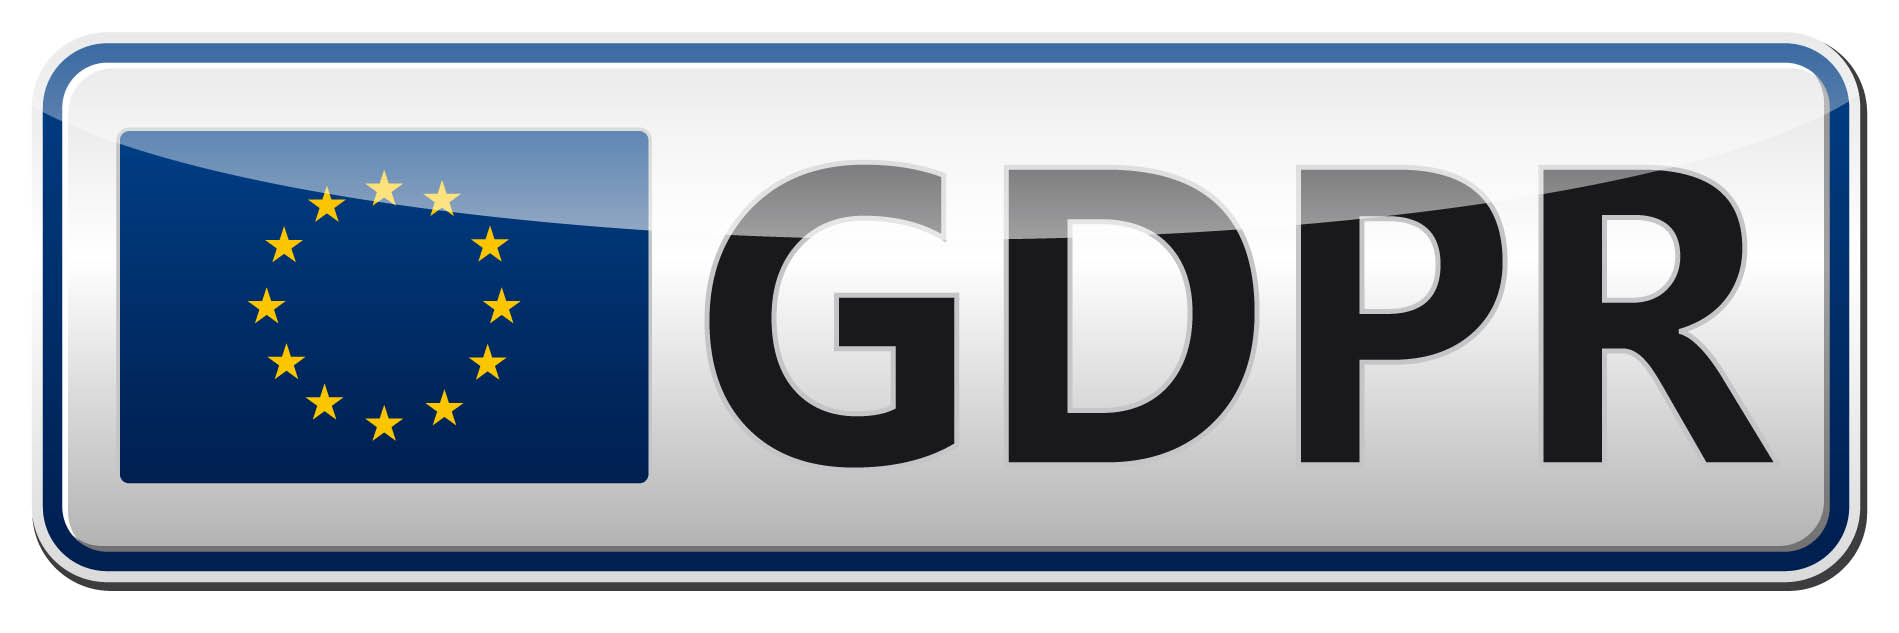 GDPR - European General Data Protection Regulation